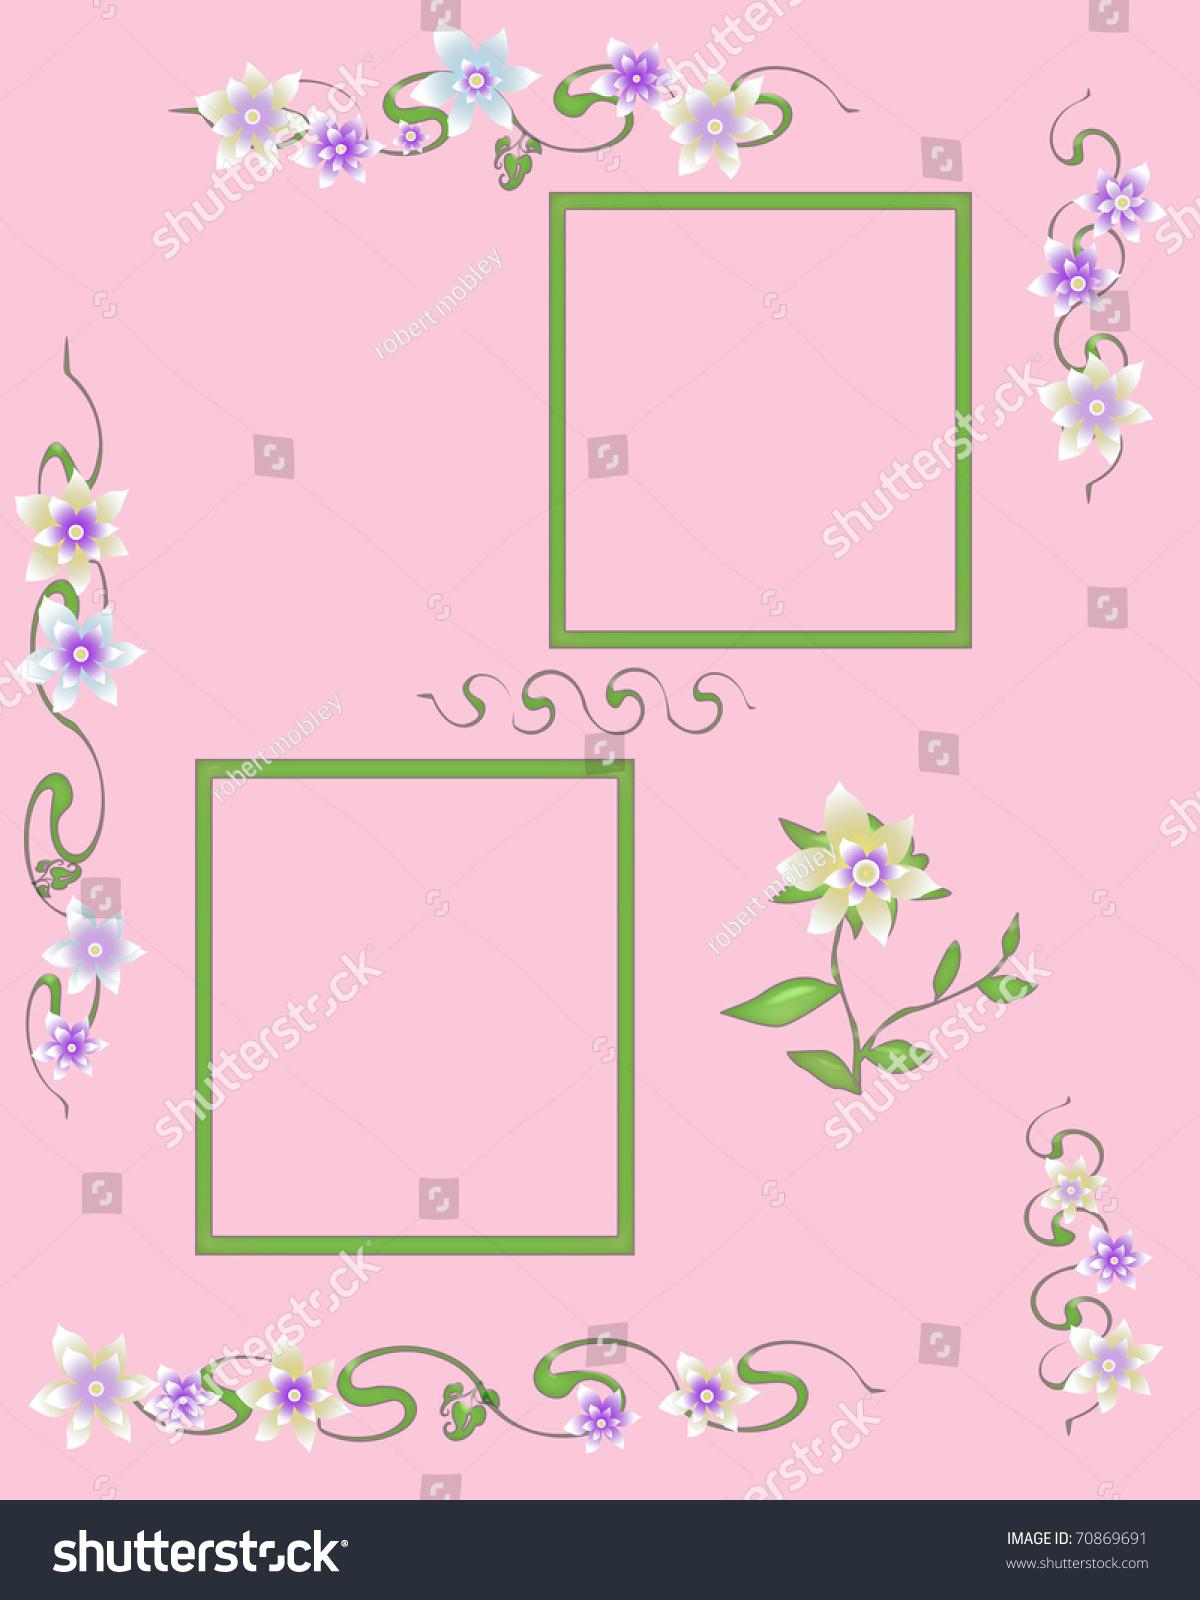 Scrapbook Frame Flower Garland Cutouts Illustration Stock ...